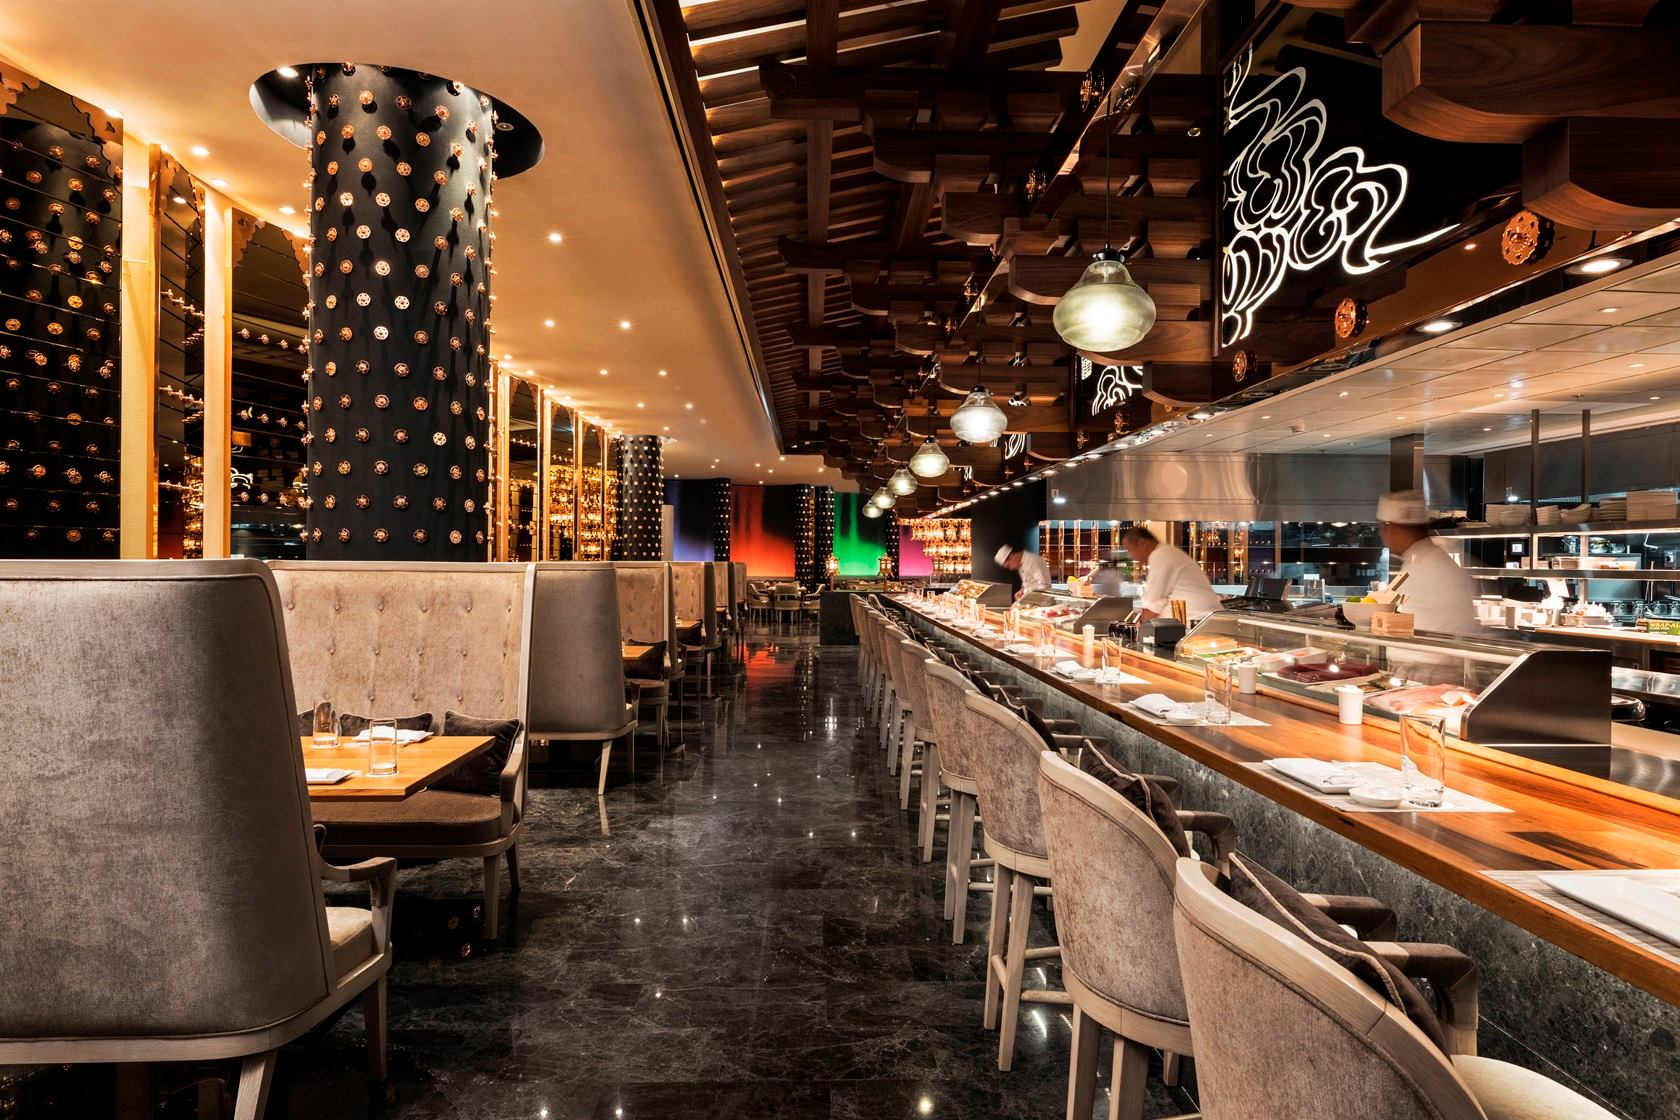 Morimoto Doha for Chef Masaharu Morimoto and Morgans Hotel Group